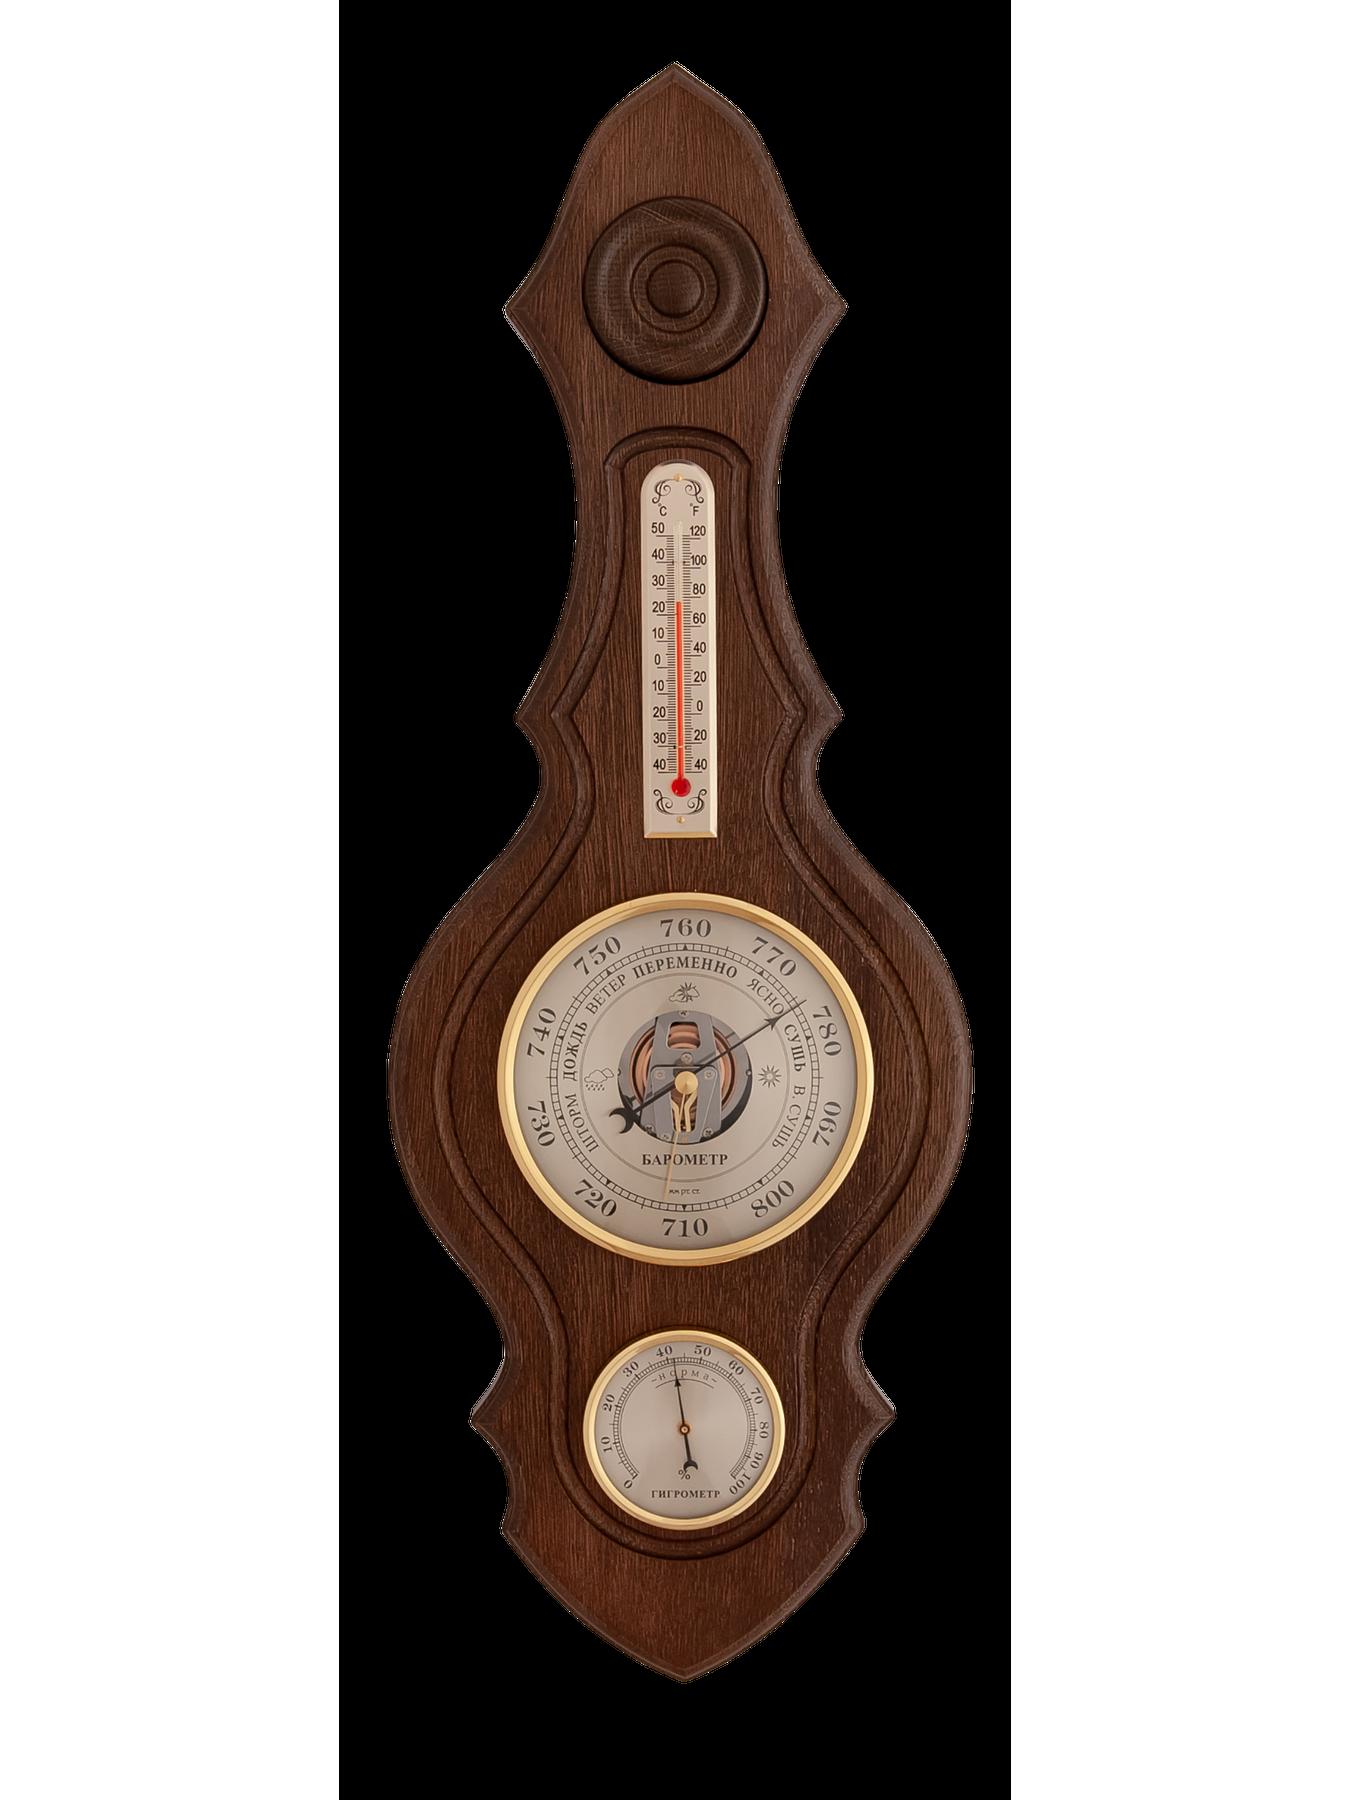 Домашняя метеостанция СМИЧ БМ 74 барометр ,гигрометр, термометр.|Датчики давления| | АлиЭкспресс